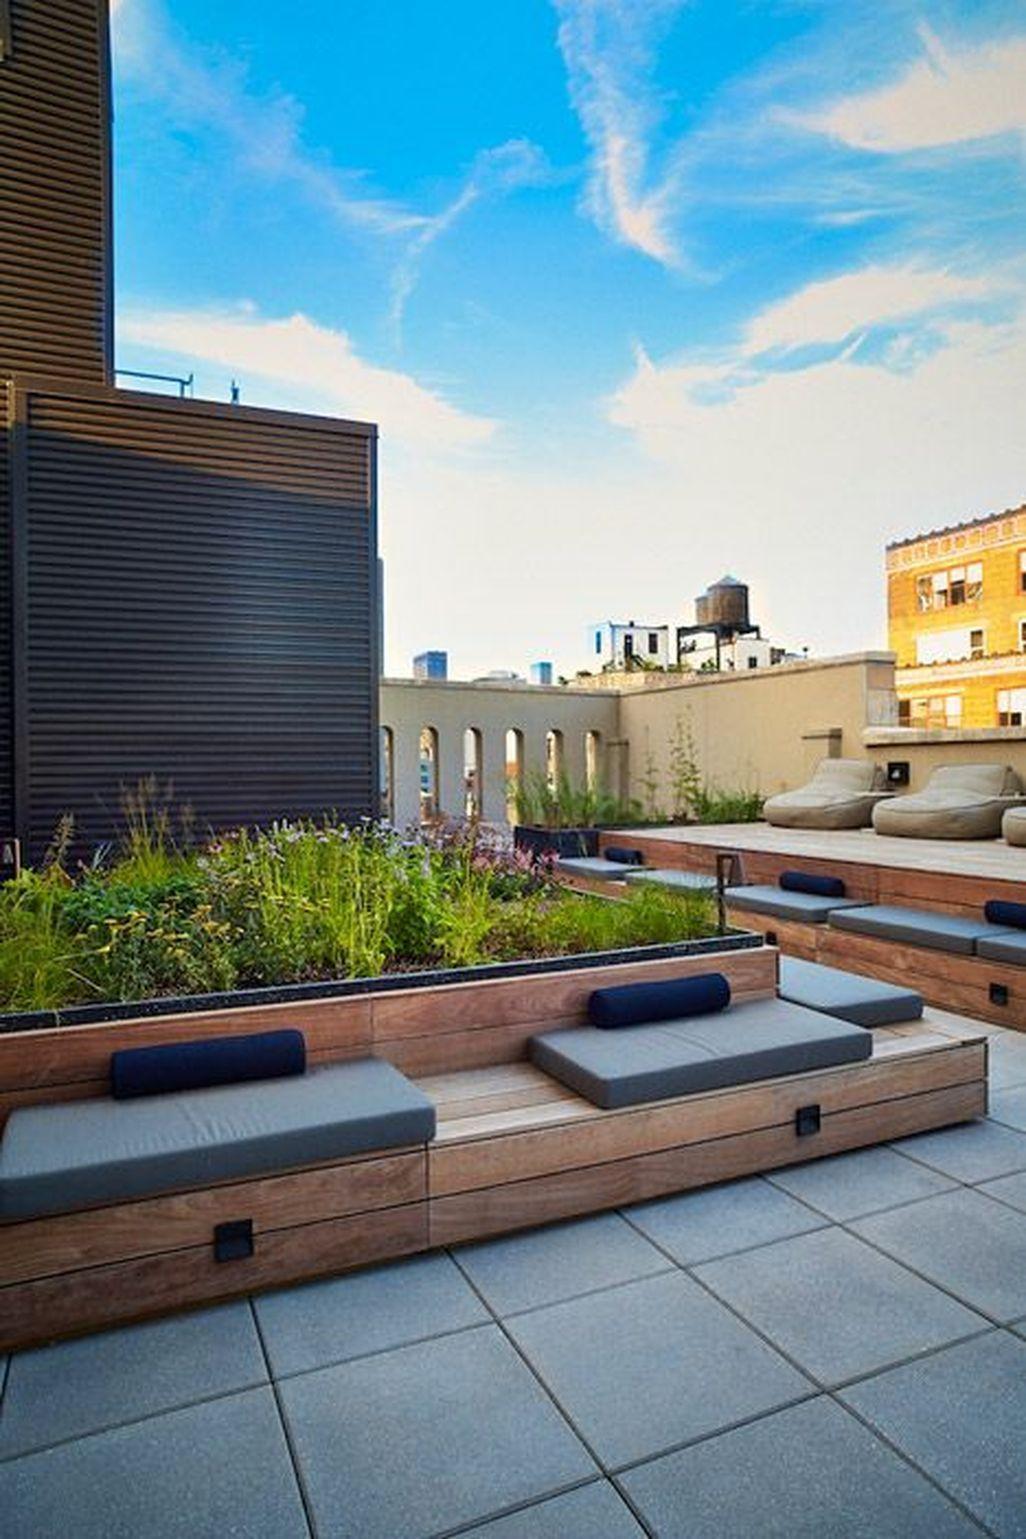 10 Best Rooftop Bars In Nyc Rooftop Terrace Design Rooftop Design Roof Terrace Design